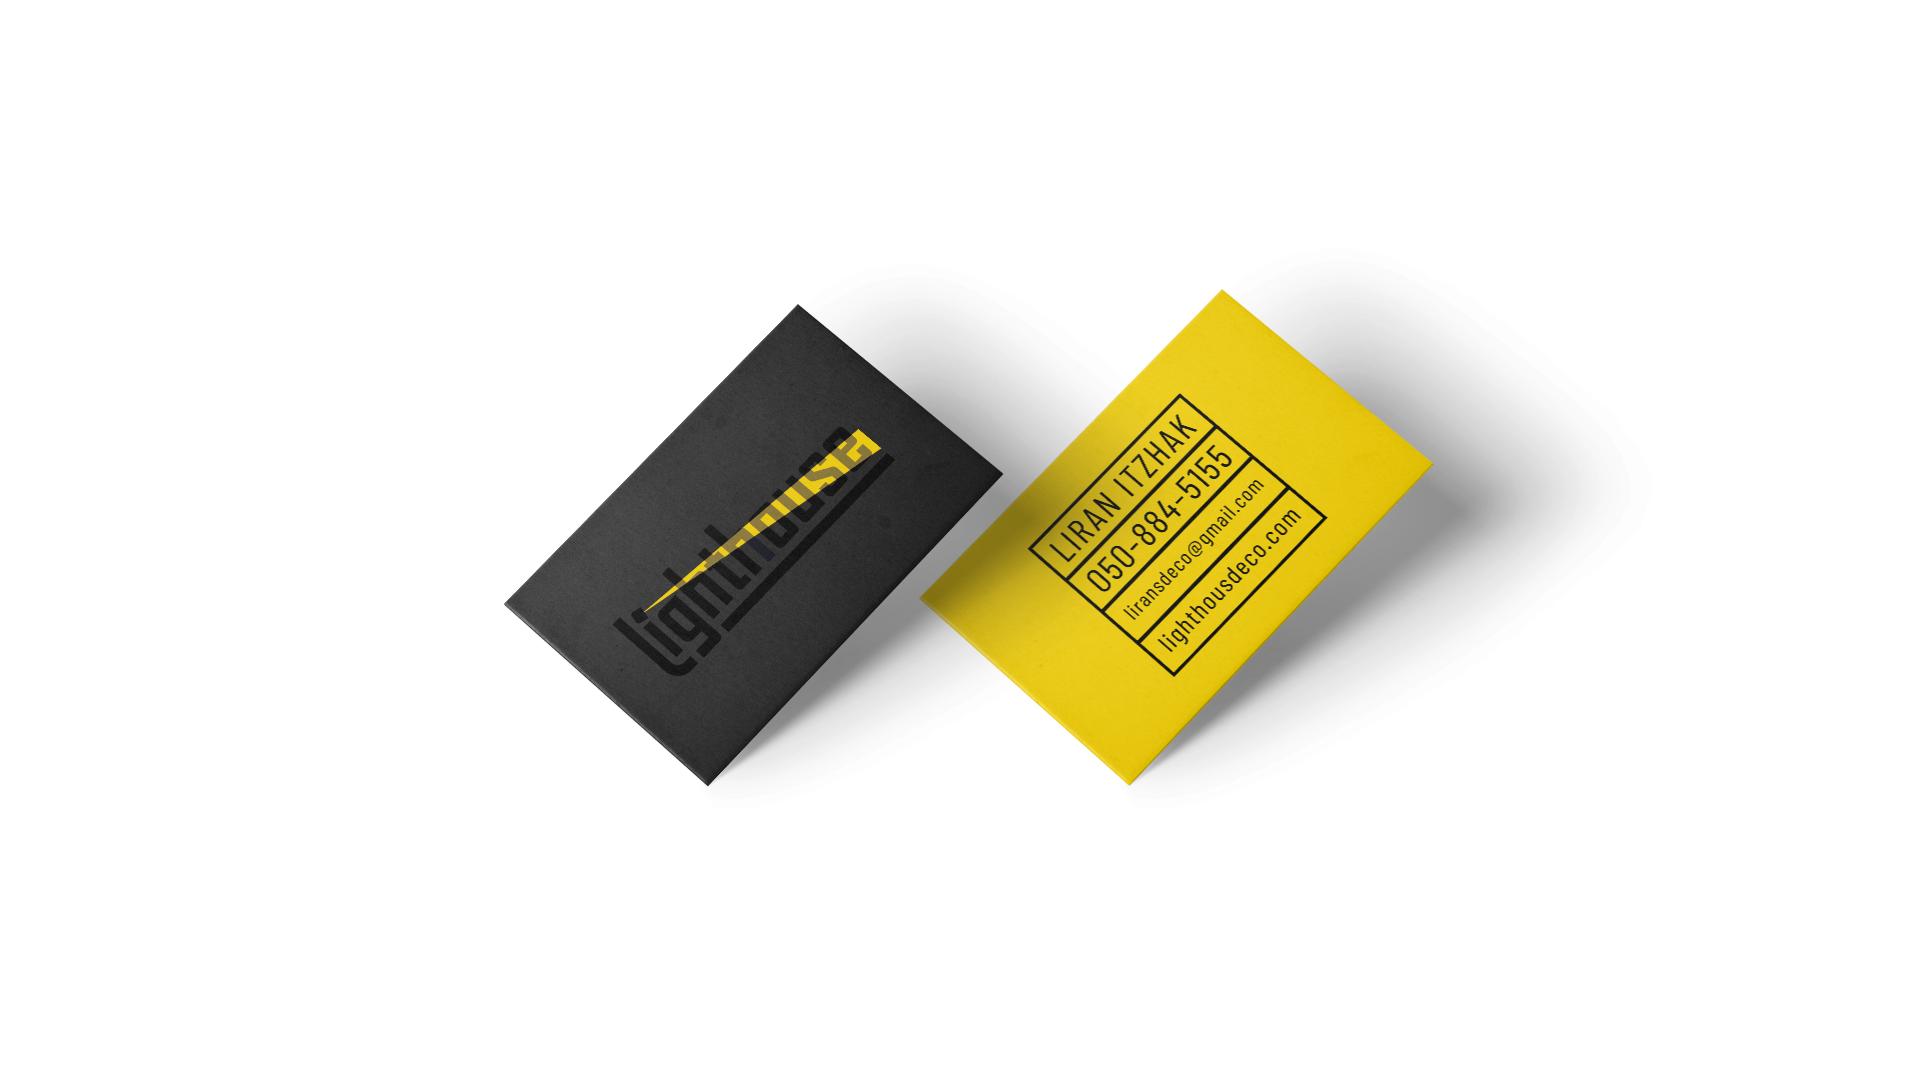 LH_b_card_black_yellow_2